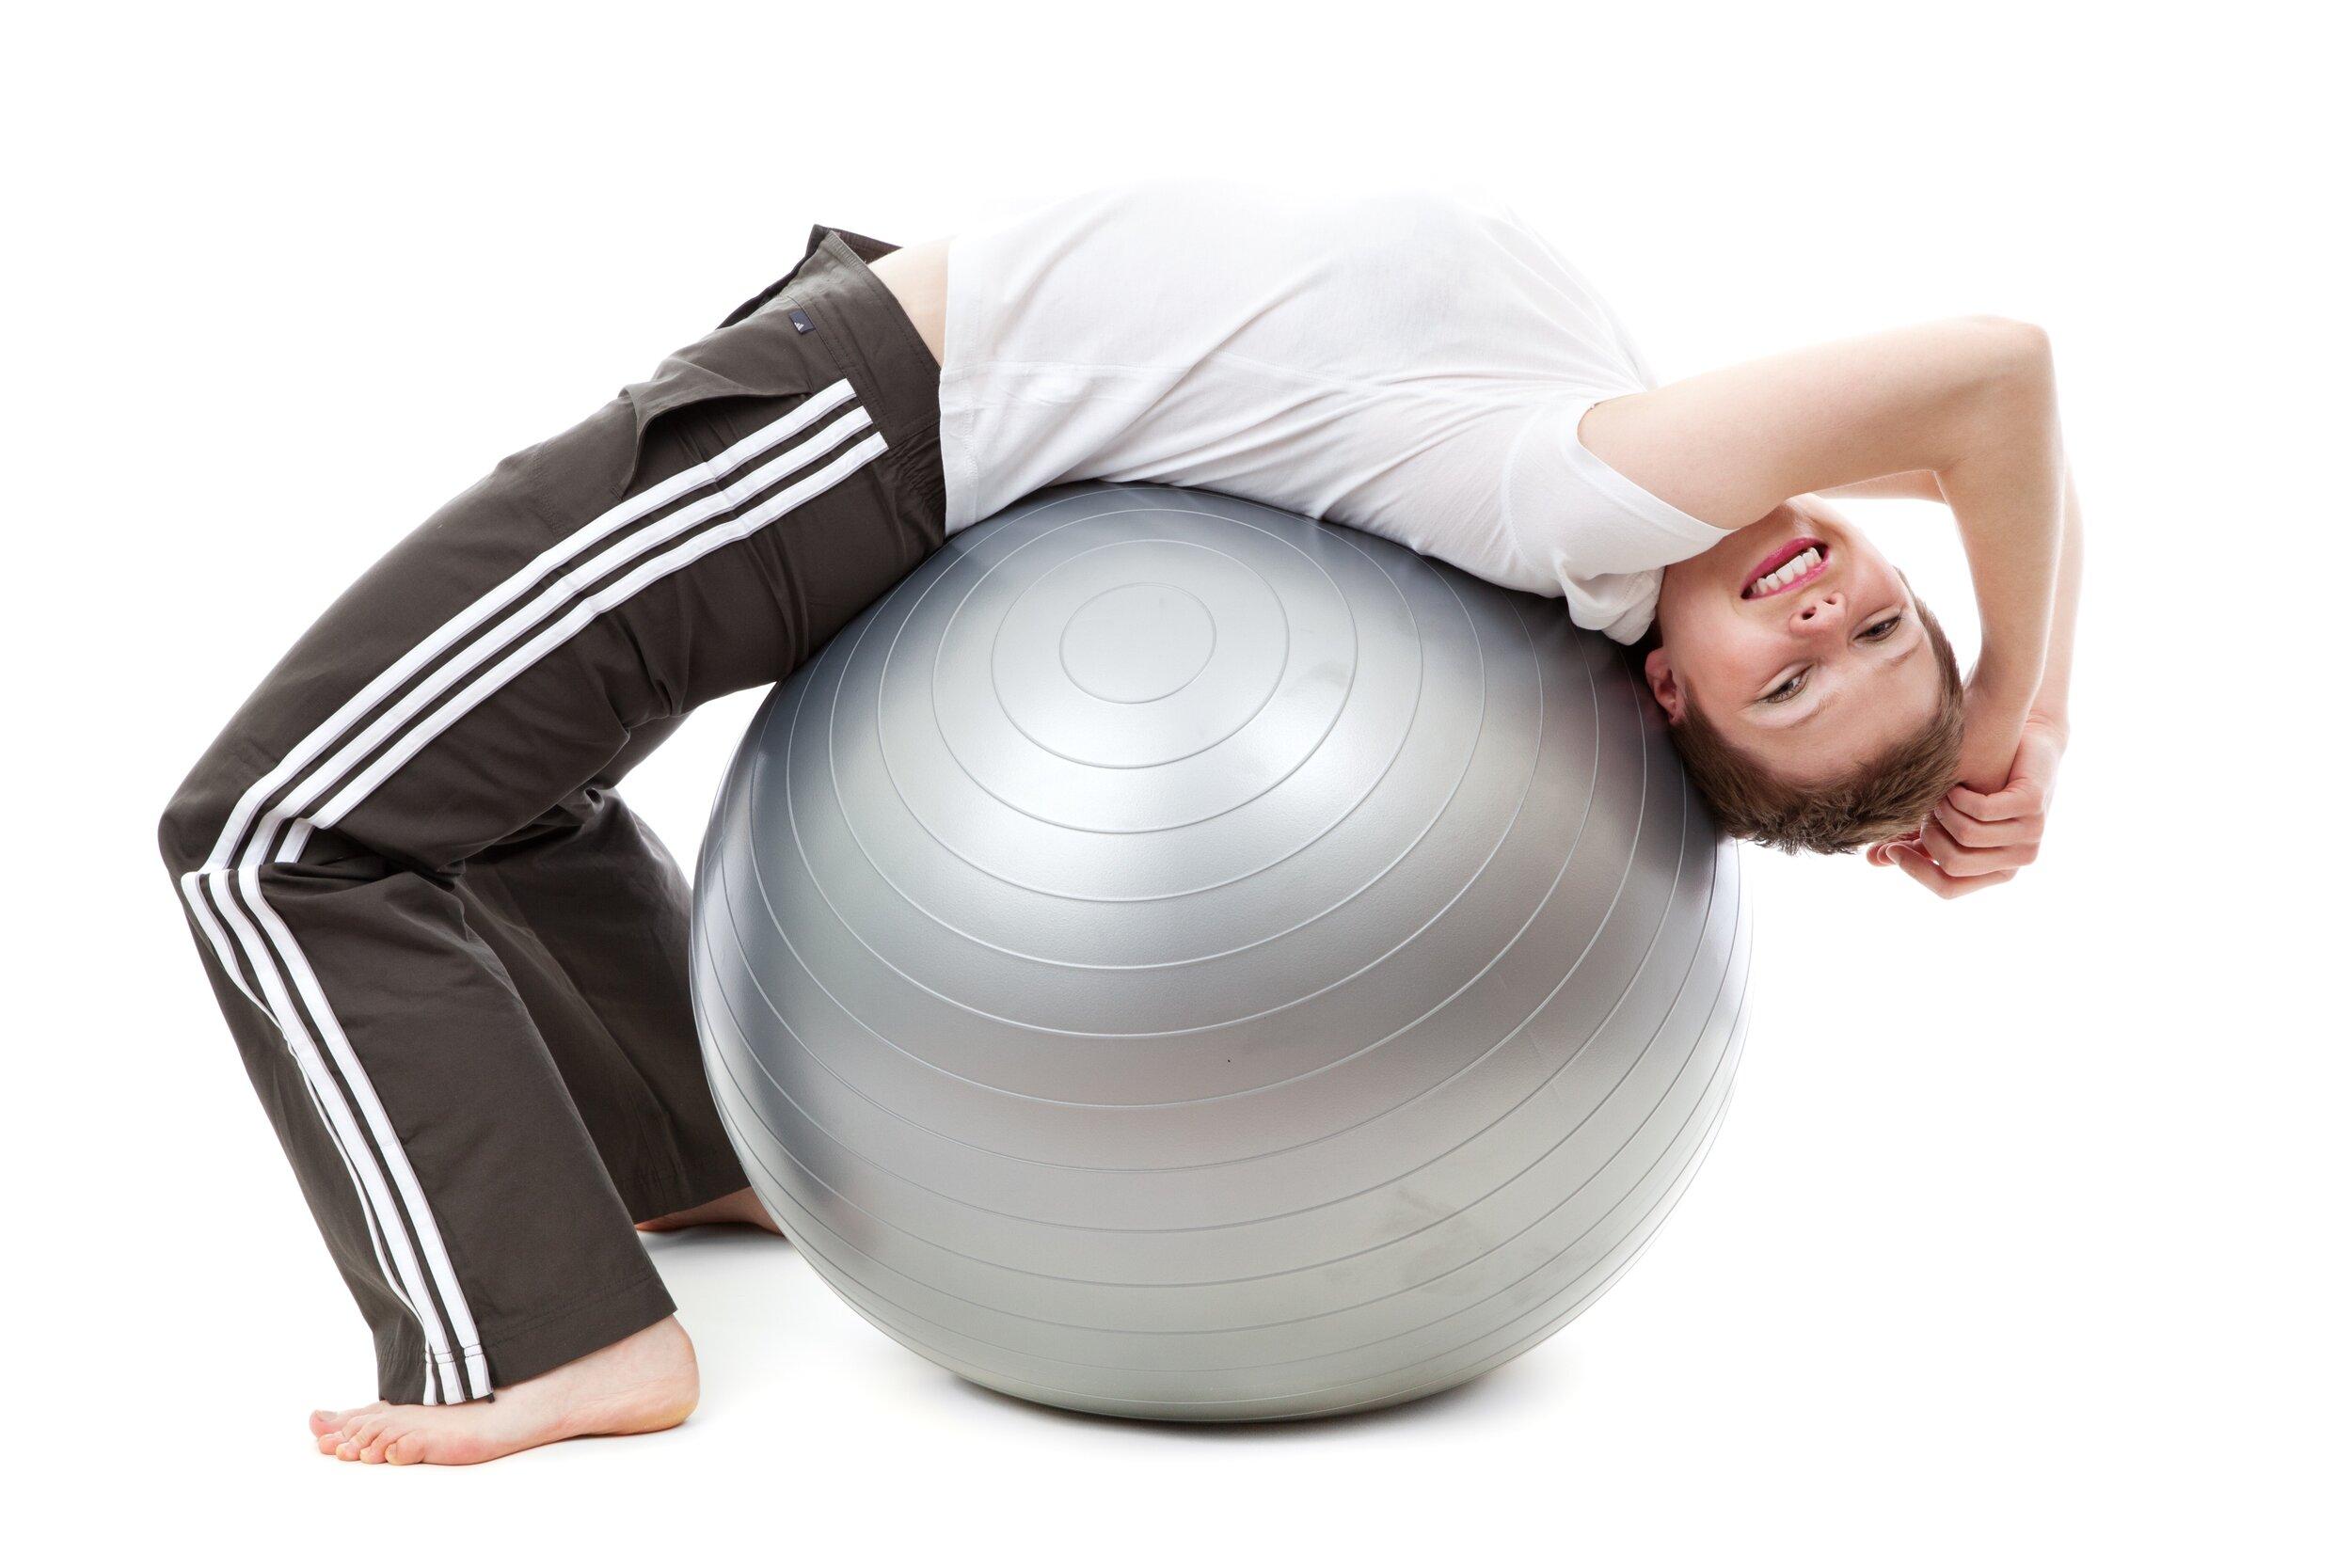 exercise-ball-fitness-healthy-41213.jpg